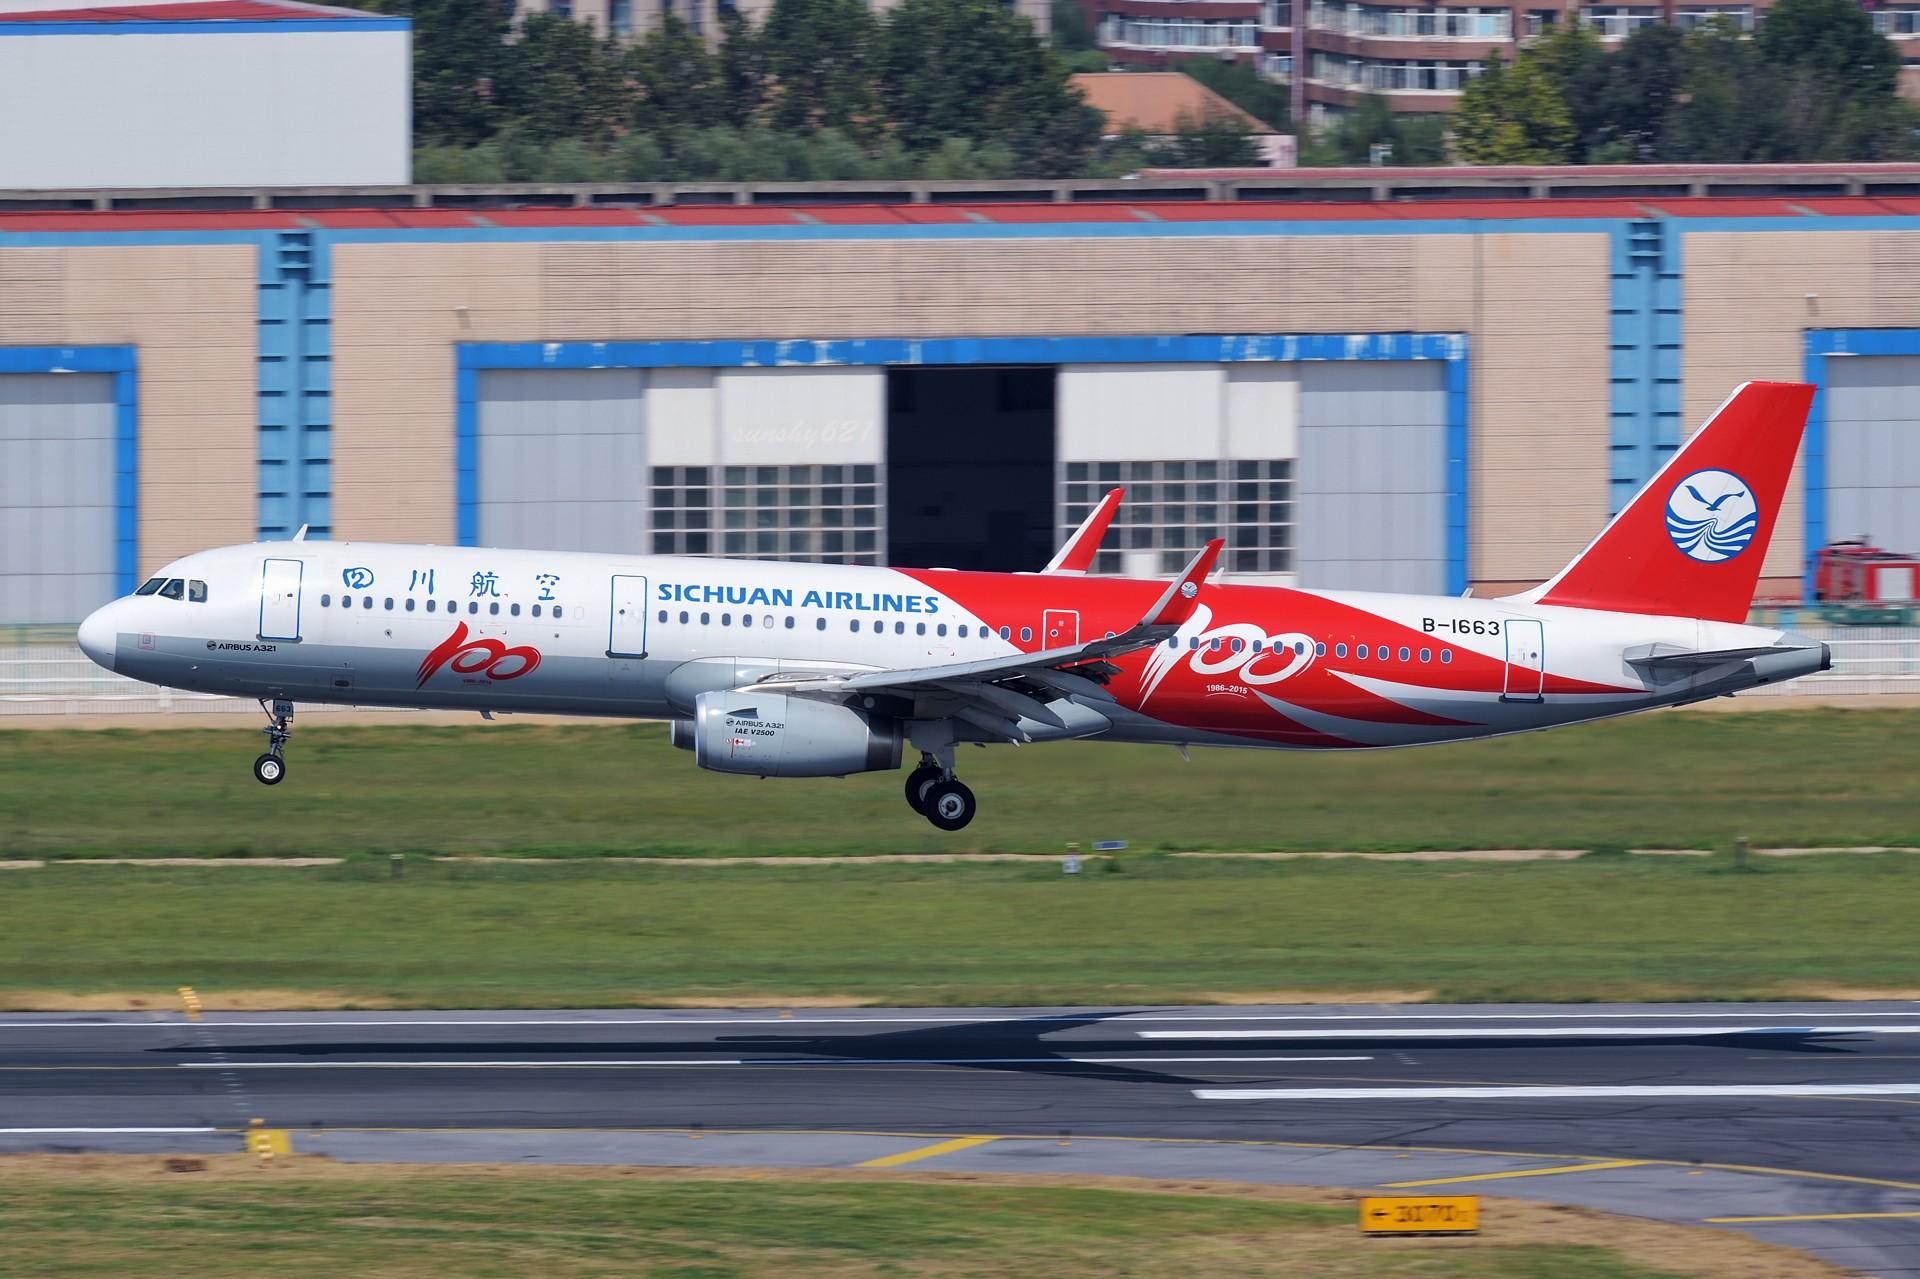 Re:[原创]★[DLC]一点有趣的事情(持续更新中)★ AIRBUS A321-200 B-1663 中国大连国际机场